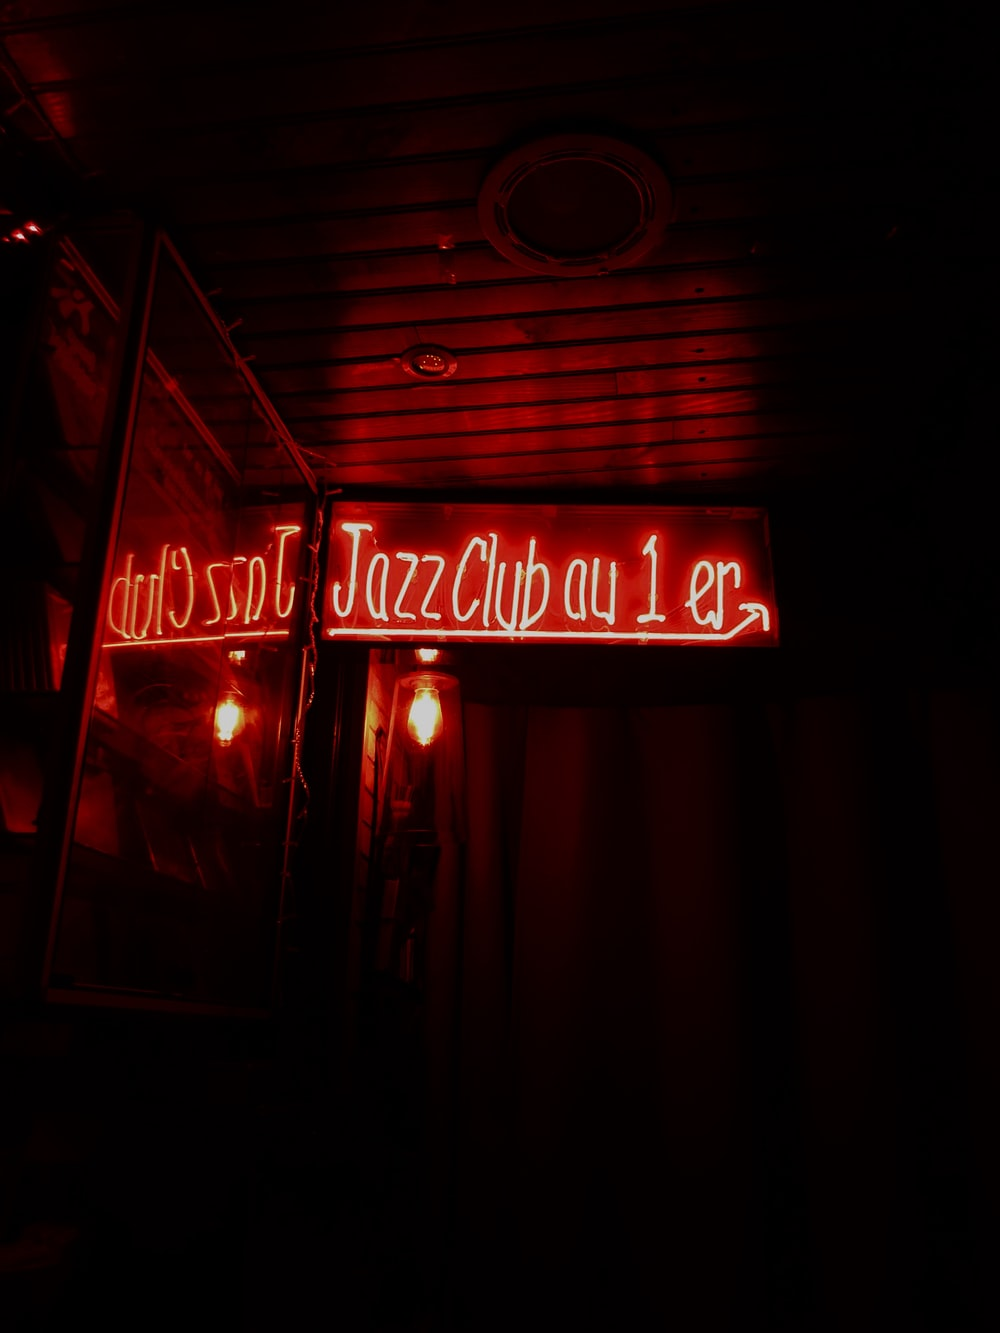 Jazz Club neon signage turned on